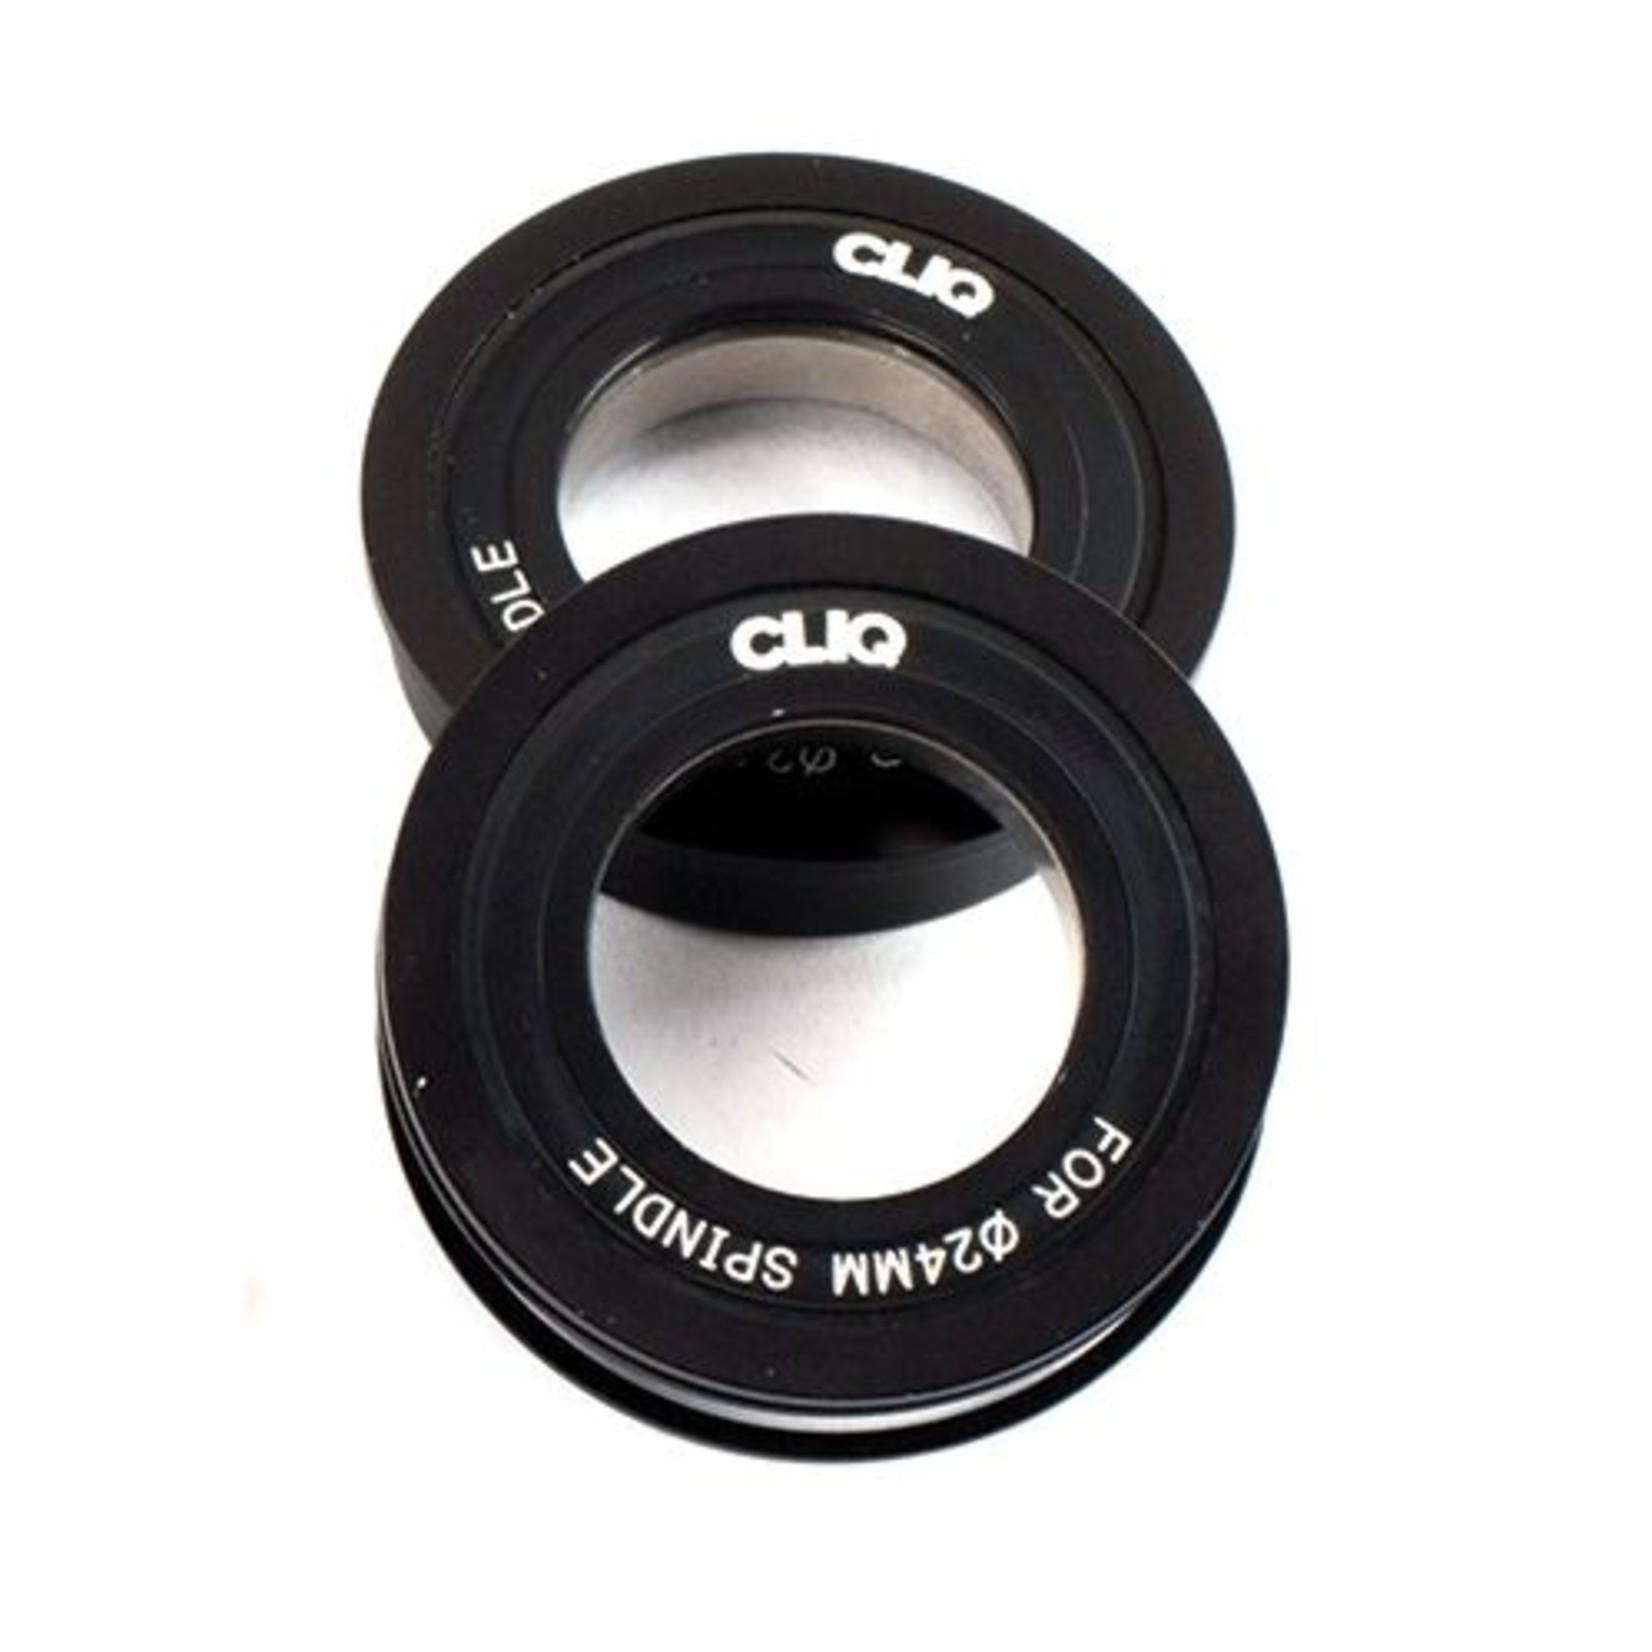 Cliq BB Ptc BB86 Black